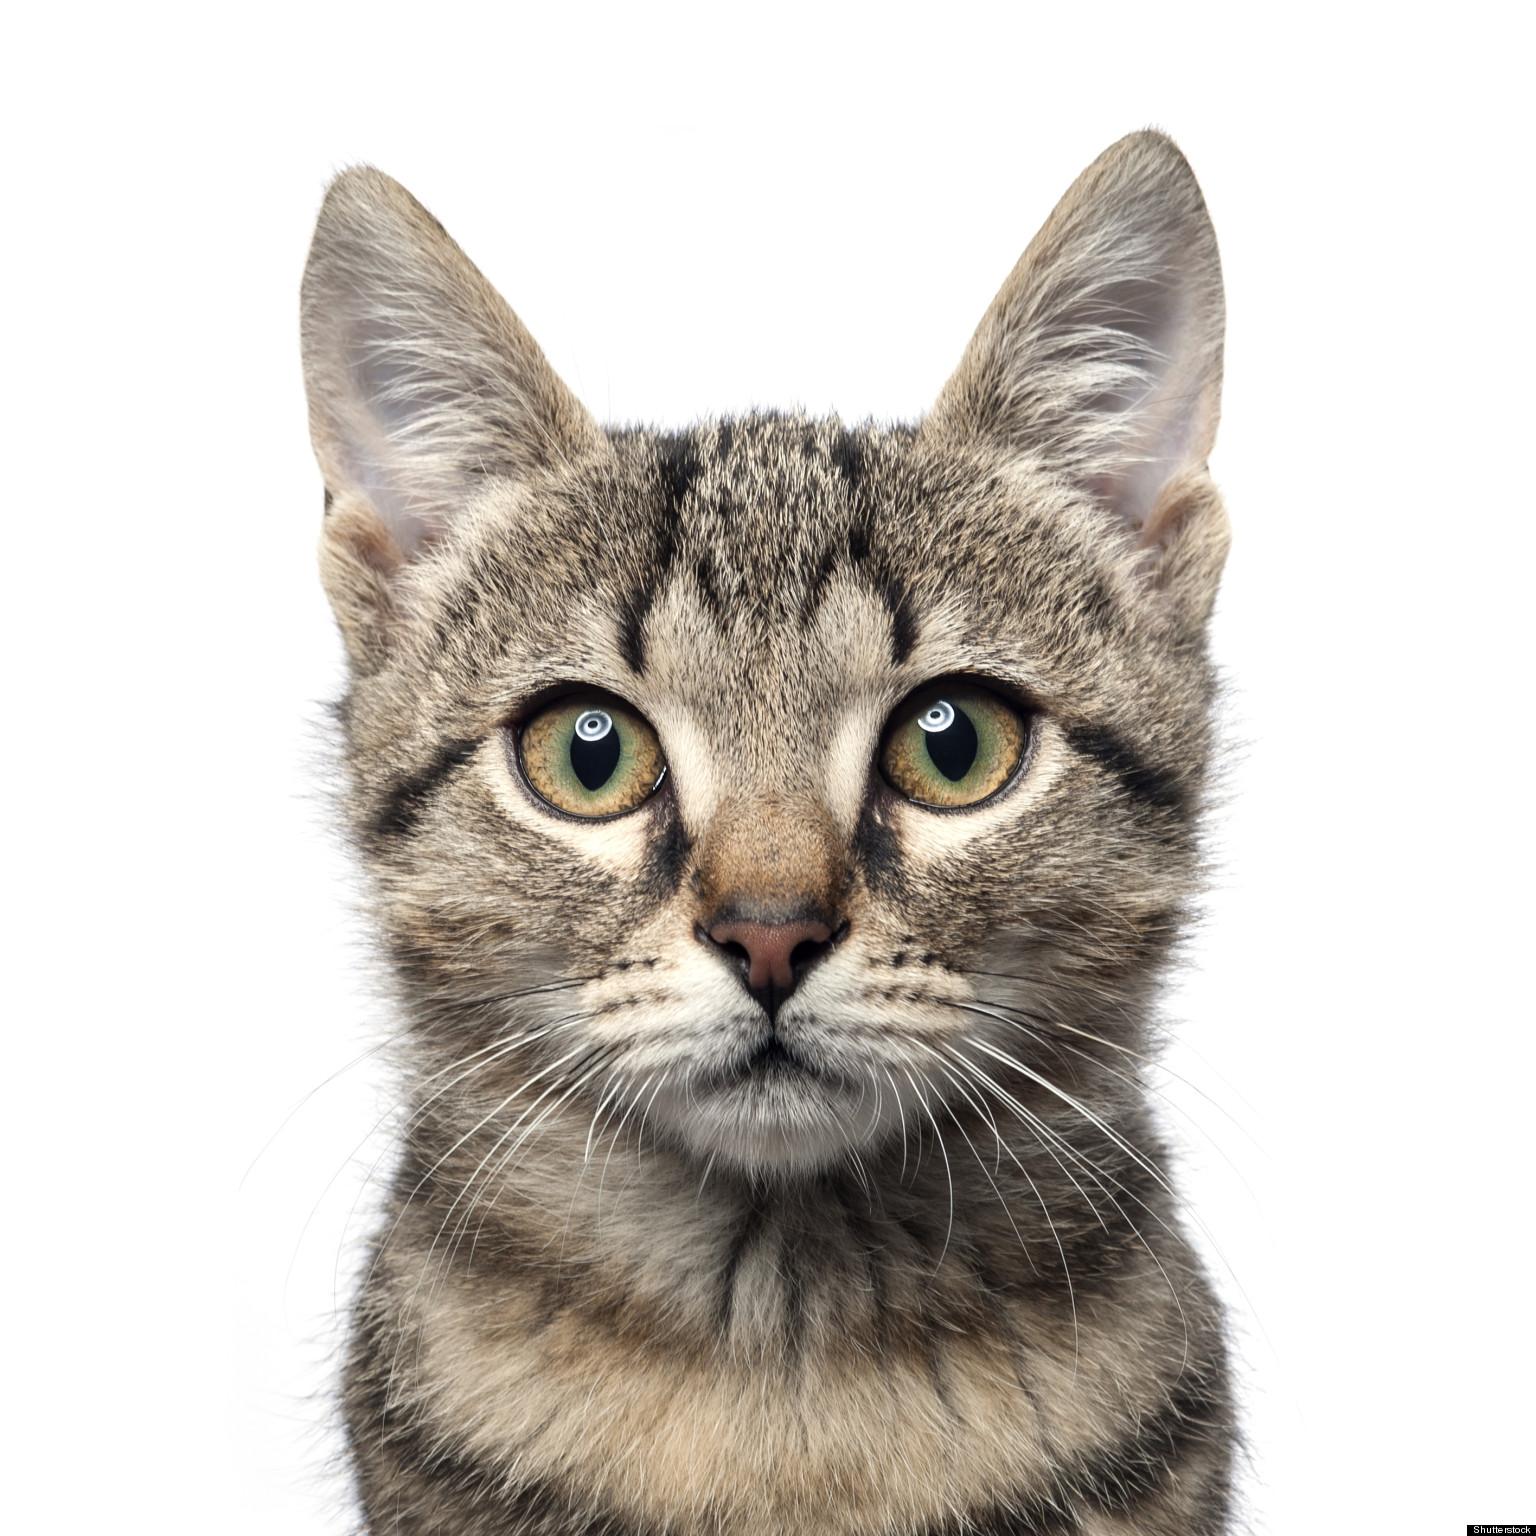 domestic cats kill billions of mice and birds per year study